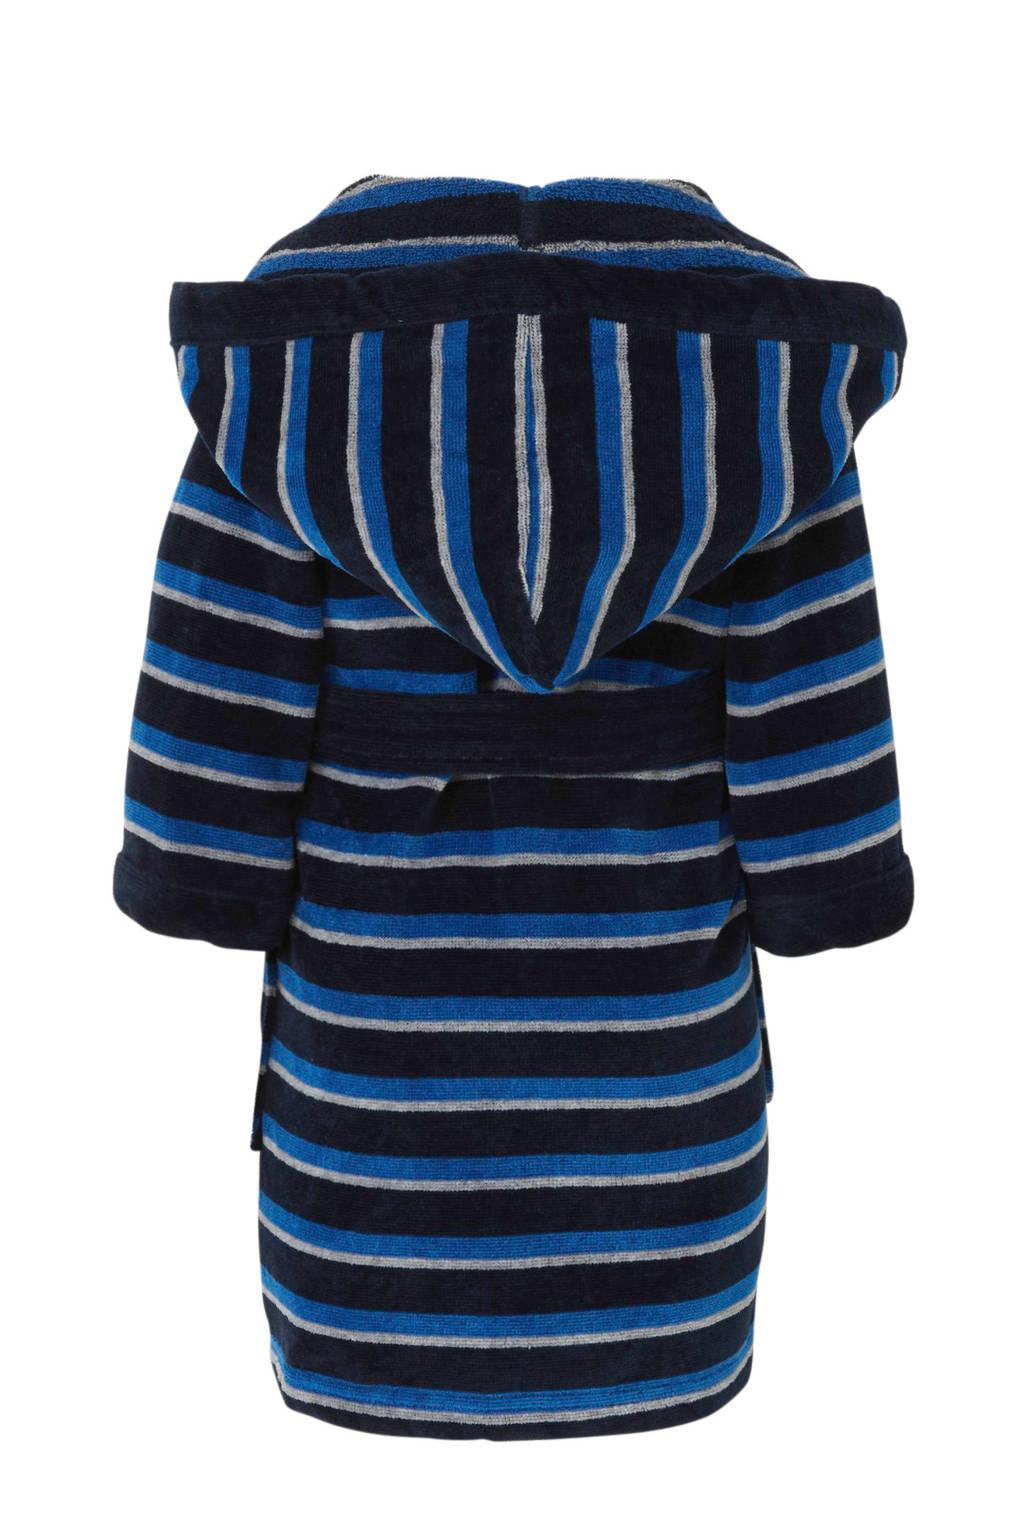 C&A Palomino   badjas streep donkerblauw, Donkerblauw